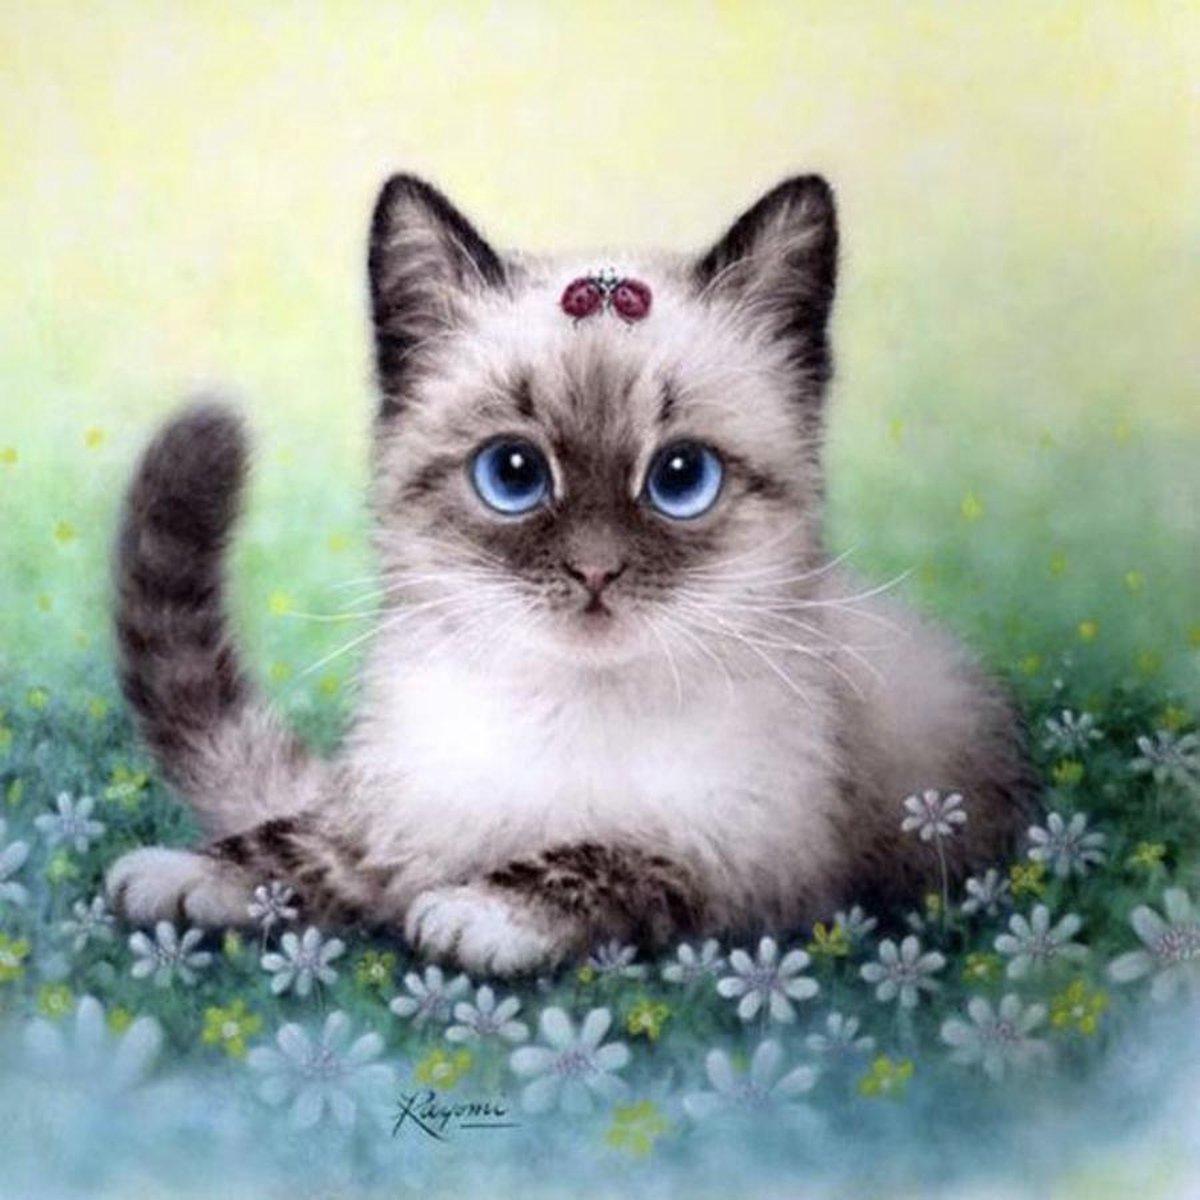 SEOS Shop ® Diamond Painting - Volwassenen - Volledig - Hobby Pakket - Kitten - 40x40 cm - Vierkant - Dotz